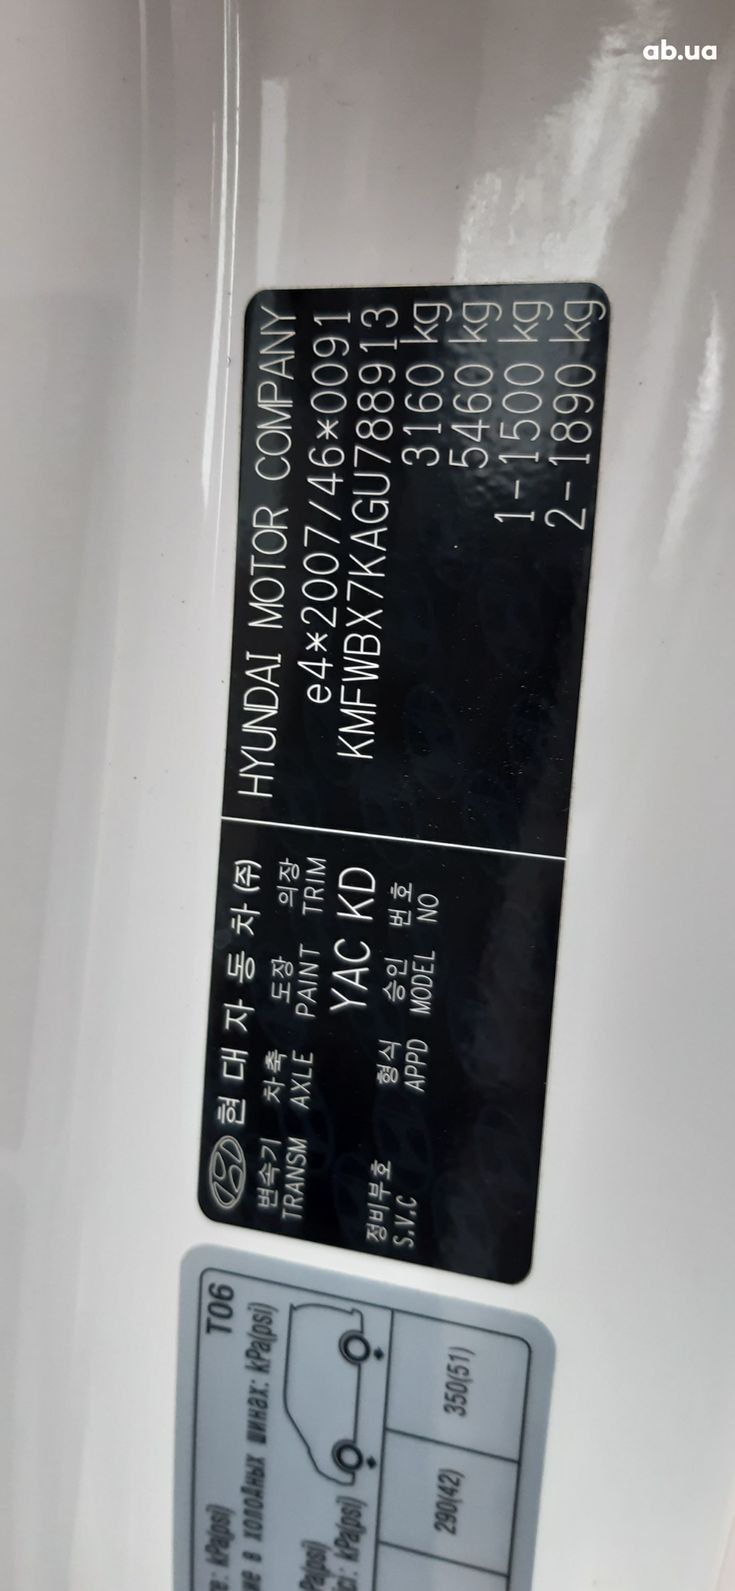 Hyundai H-1 2016 белый - фото 2